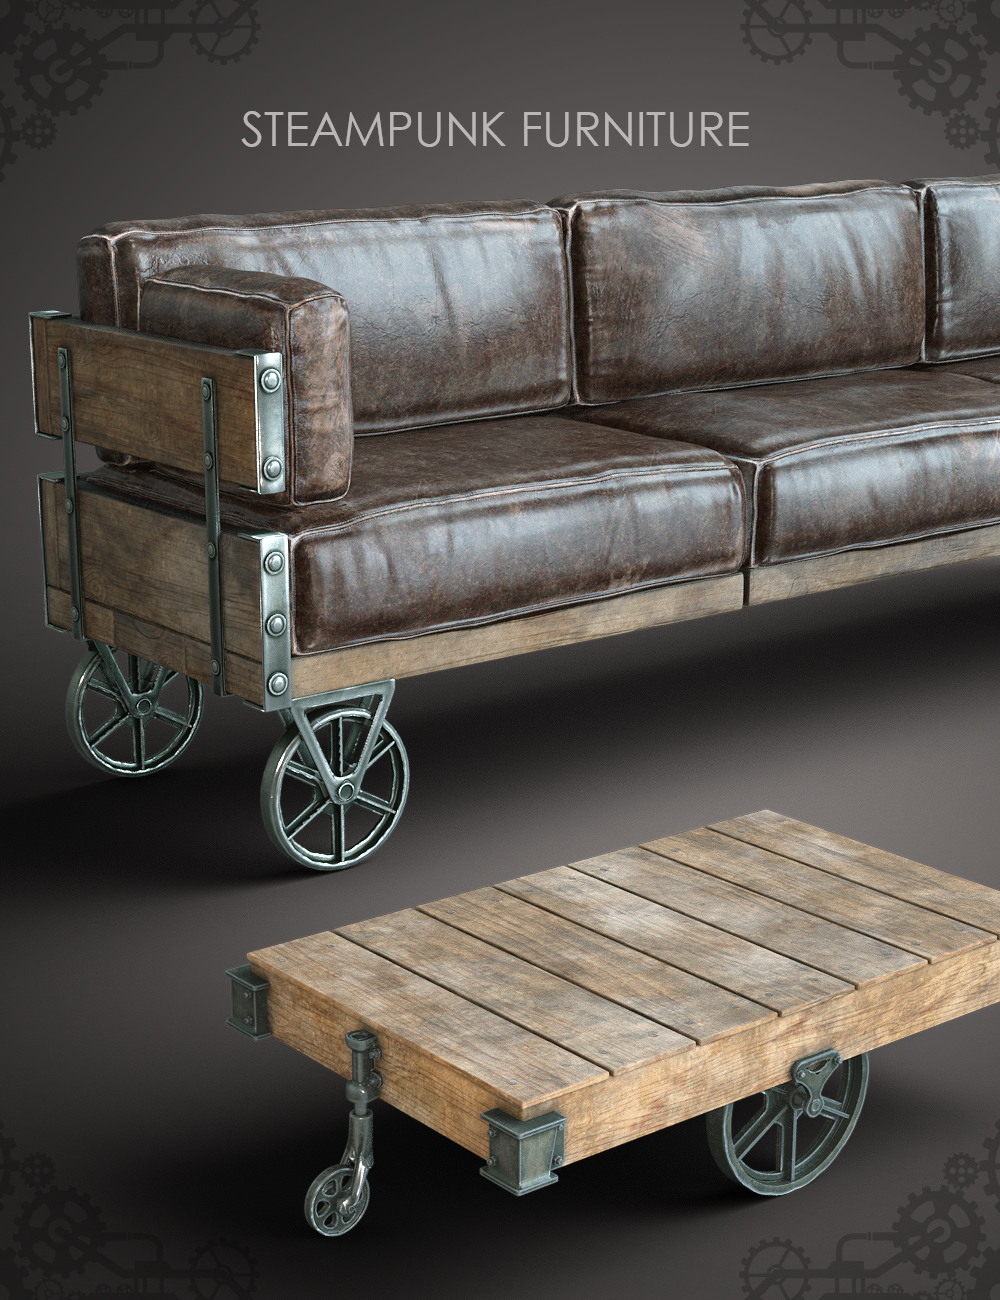 Steampunk Furniture by: fjaa3d, 3D Models by Daz 3D